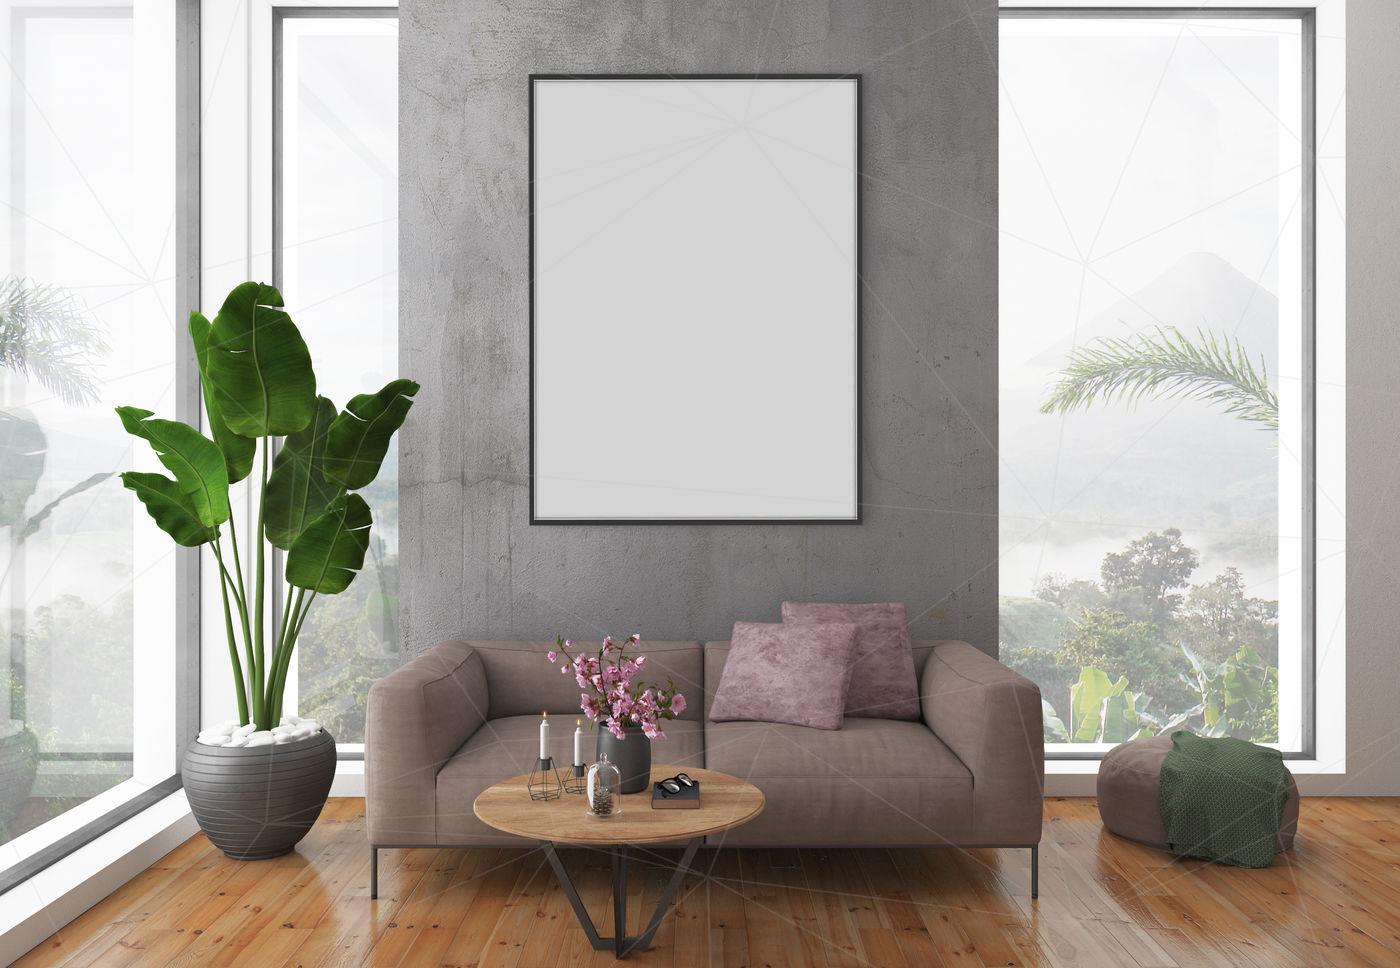 Interior mockup - blank wall mock up By Hunny Badger | TheHungryJPEG.com